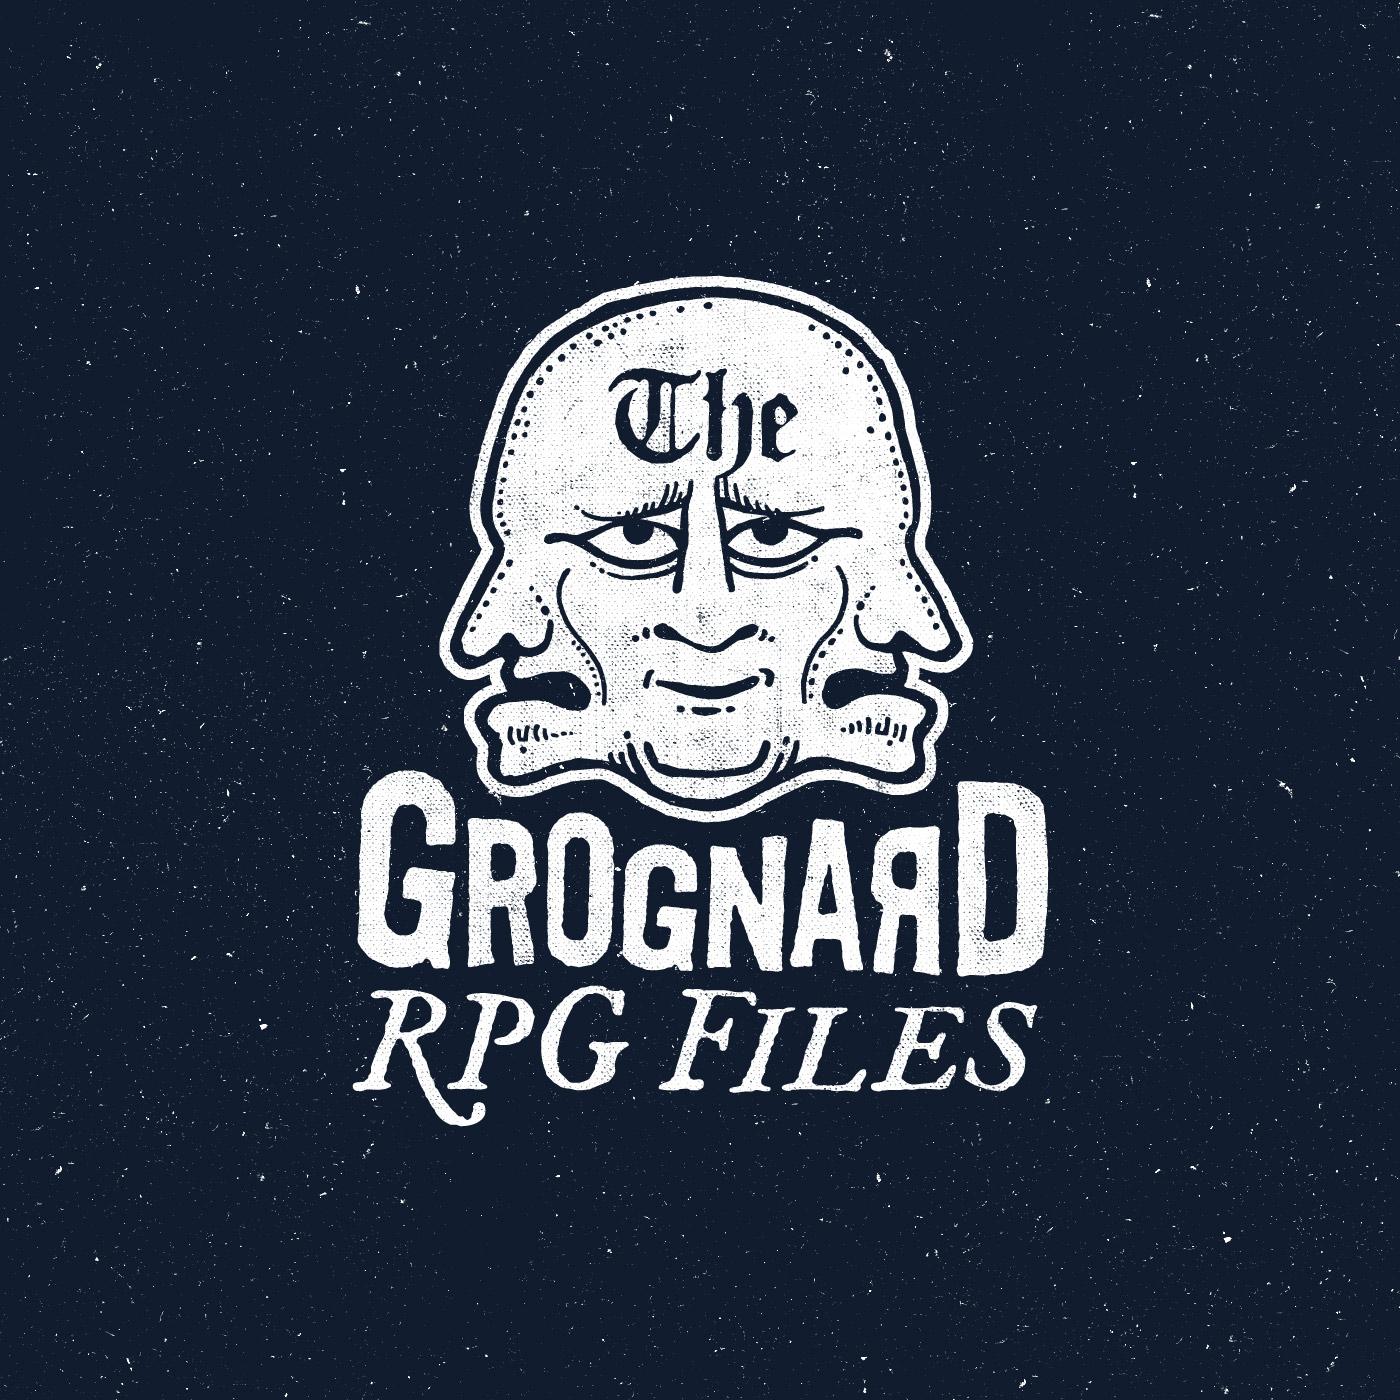 Pod Fanatic Podcast The Grognard Files Episode